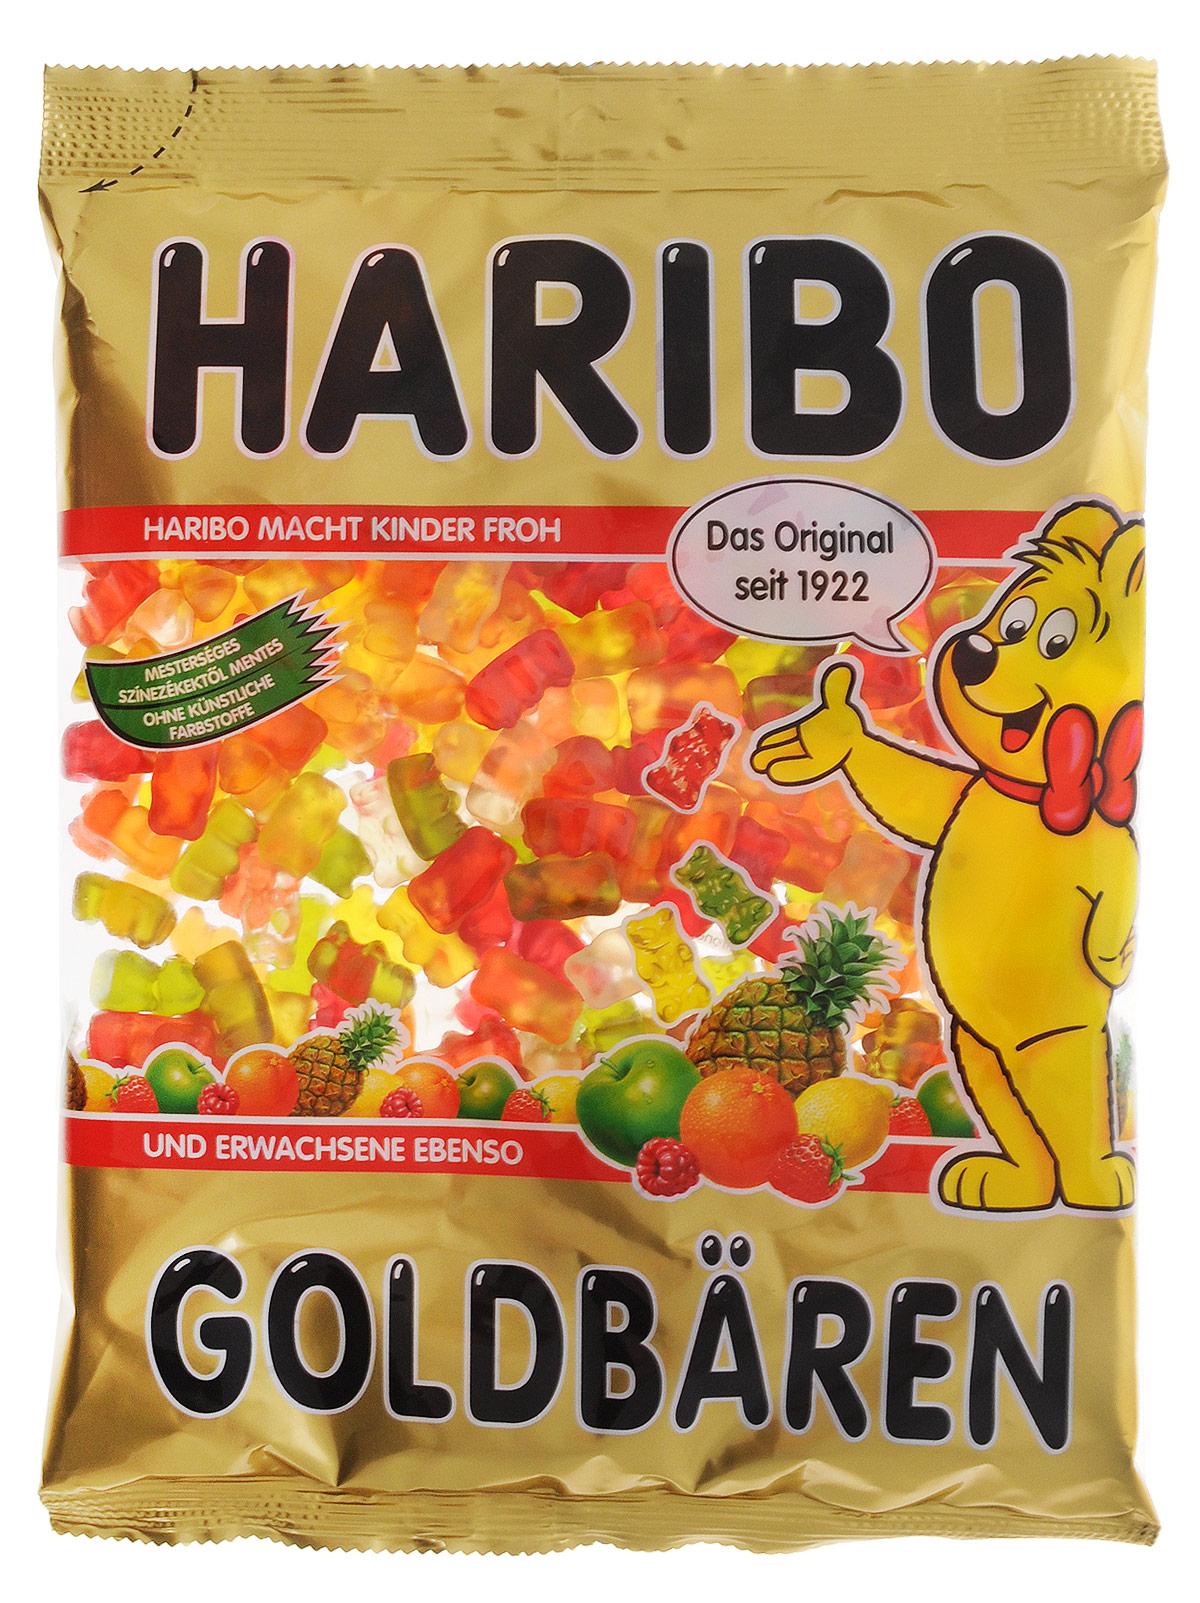 Haribo Золотые мишки жевательный мармелад, 1 кг жевательный мармелад haribo червячки 70г